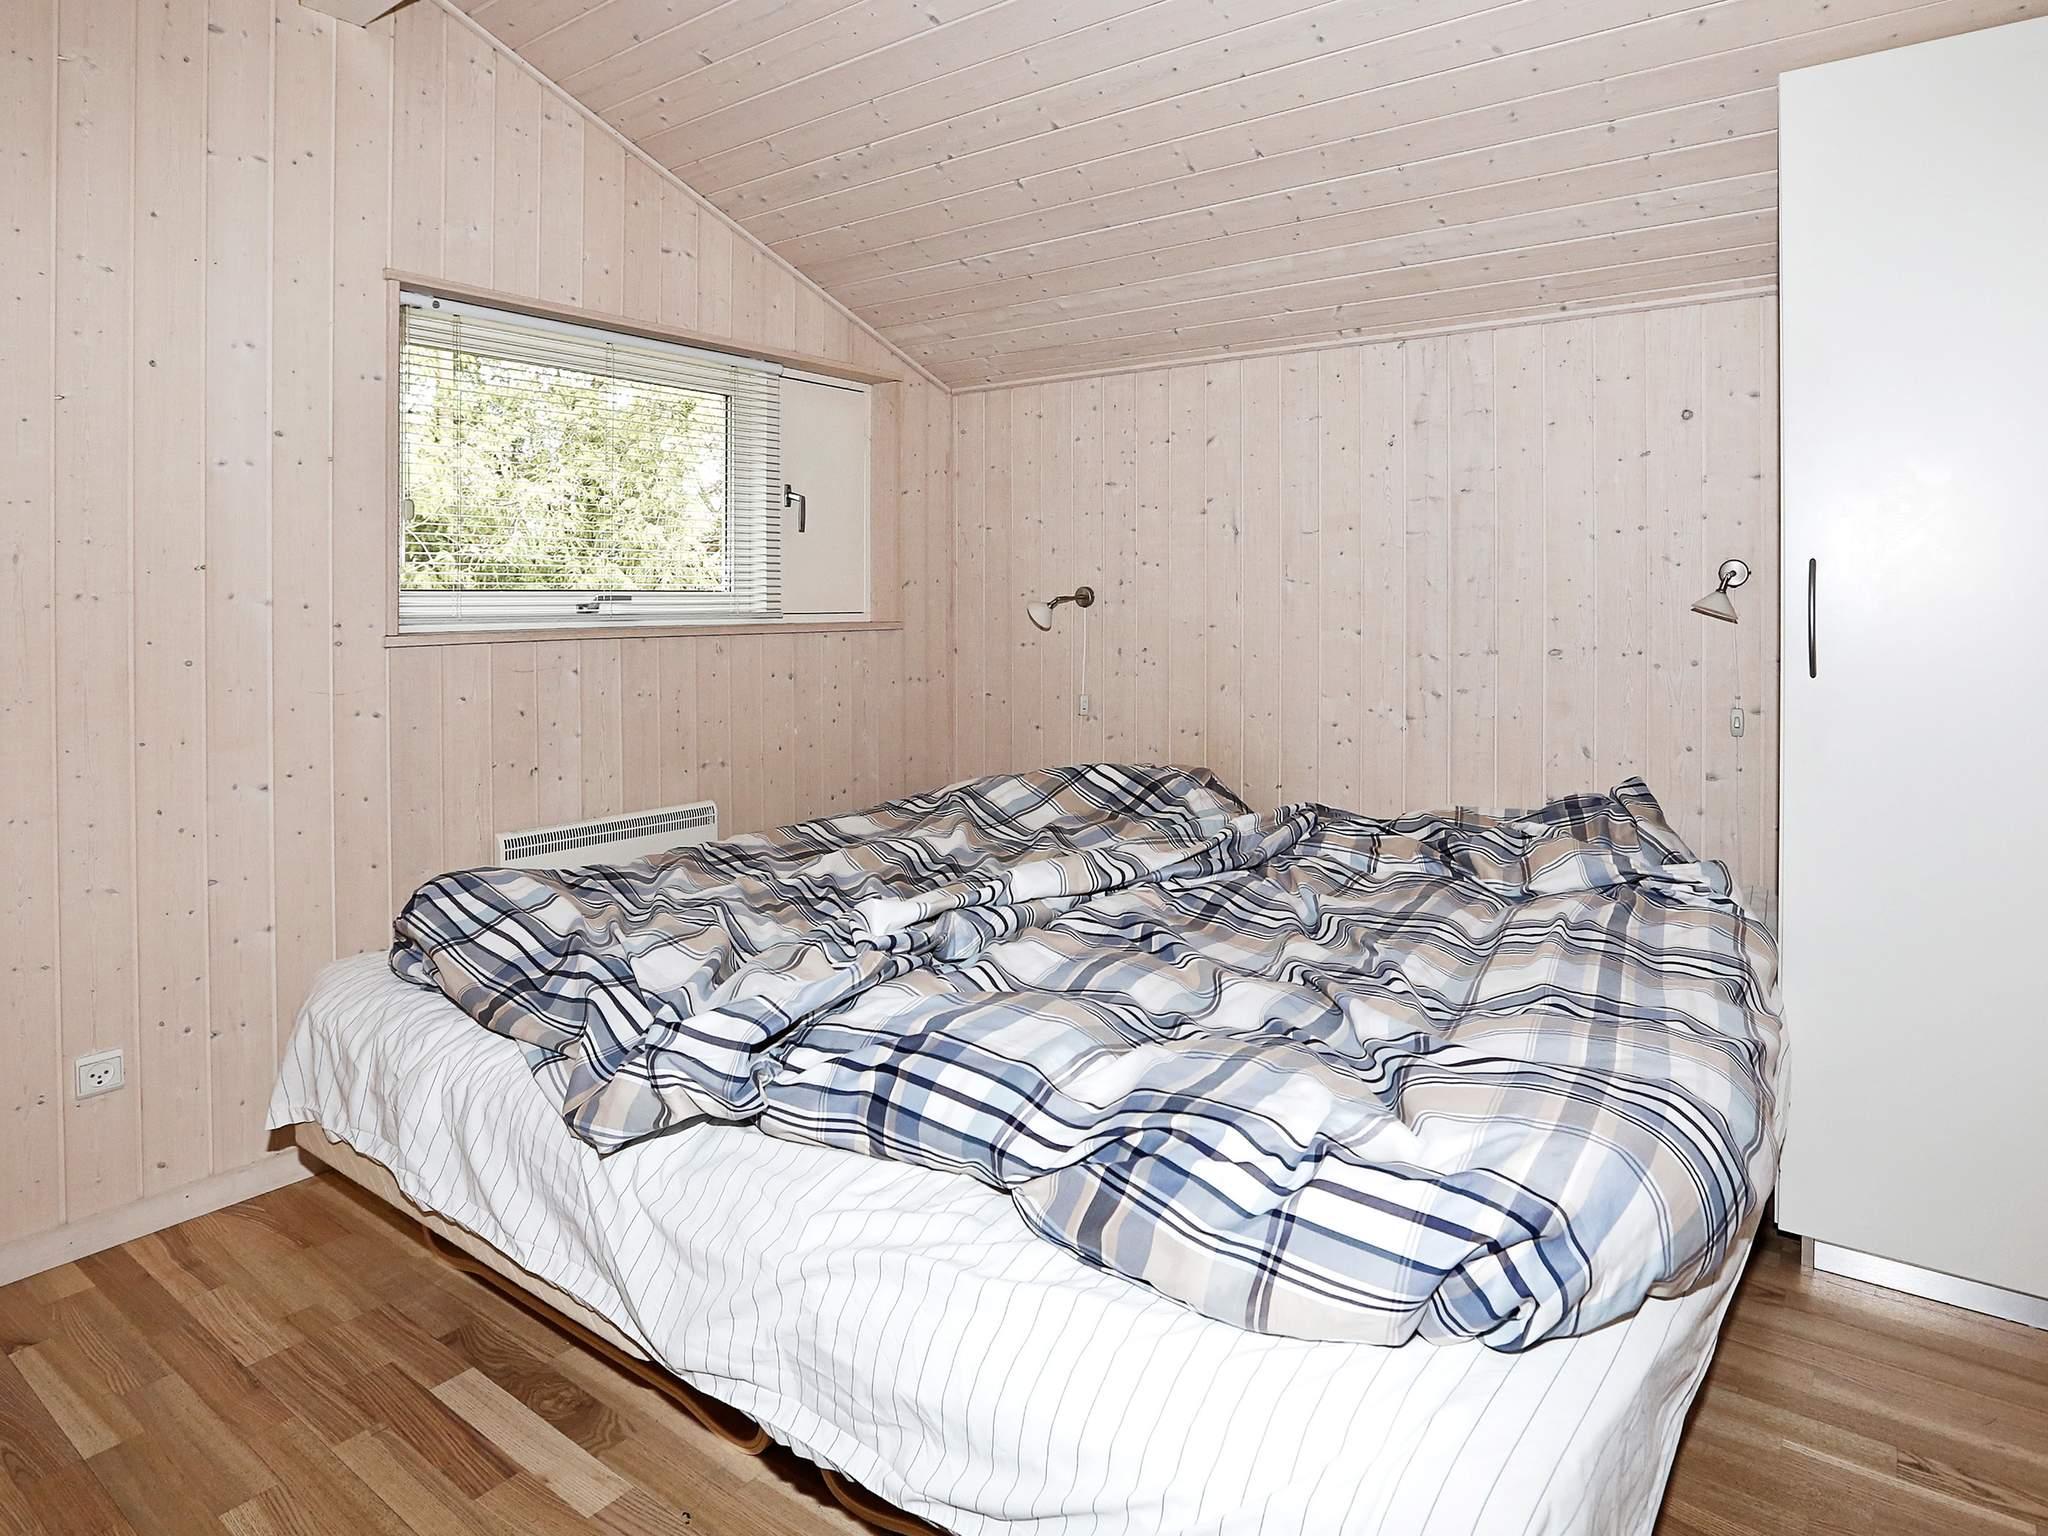 Maison de vacances Skibby (124927), Kirke Hyllinge, , Seeland Nord, Danemark, image 9